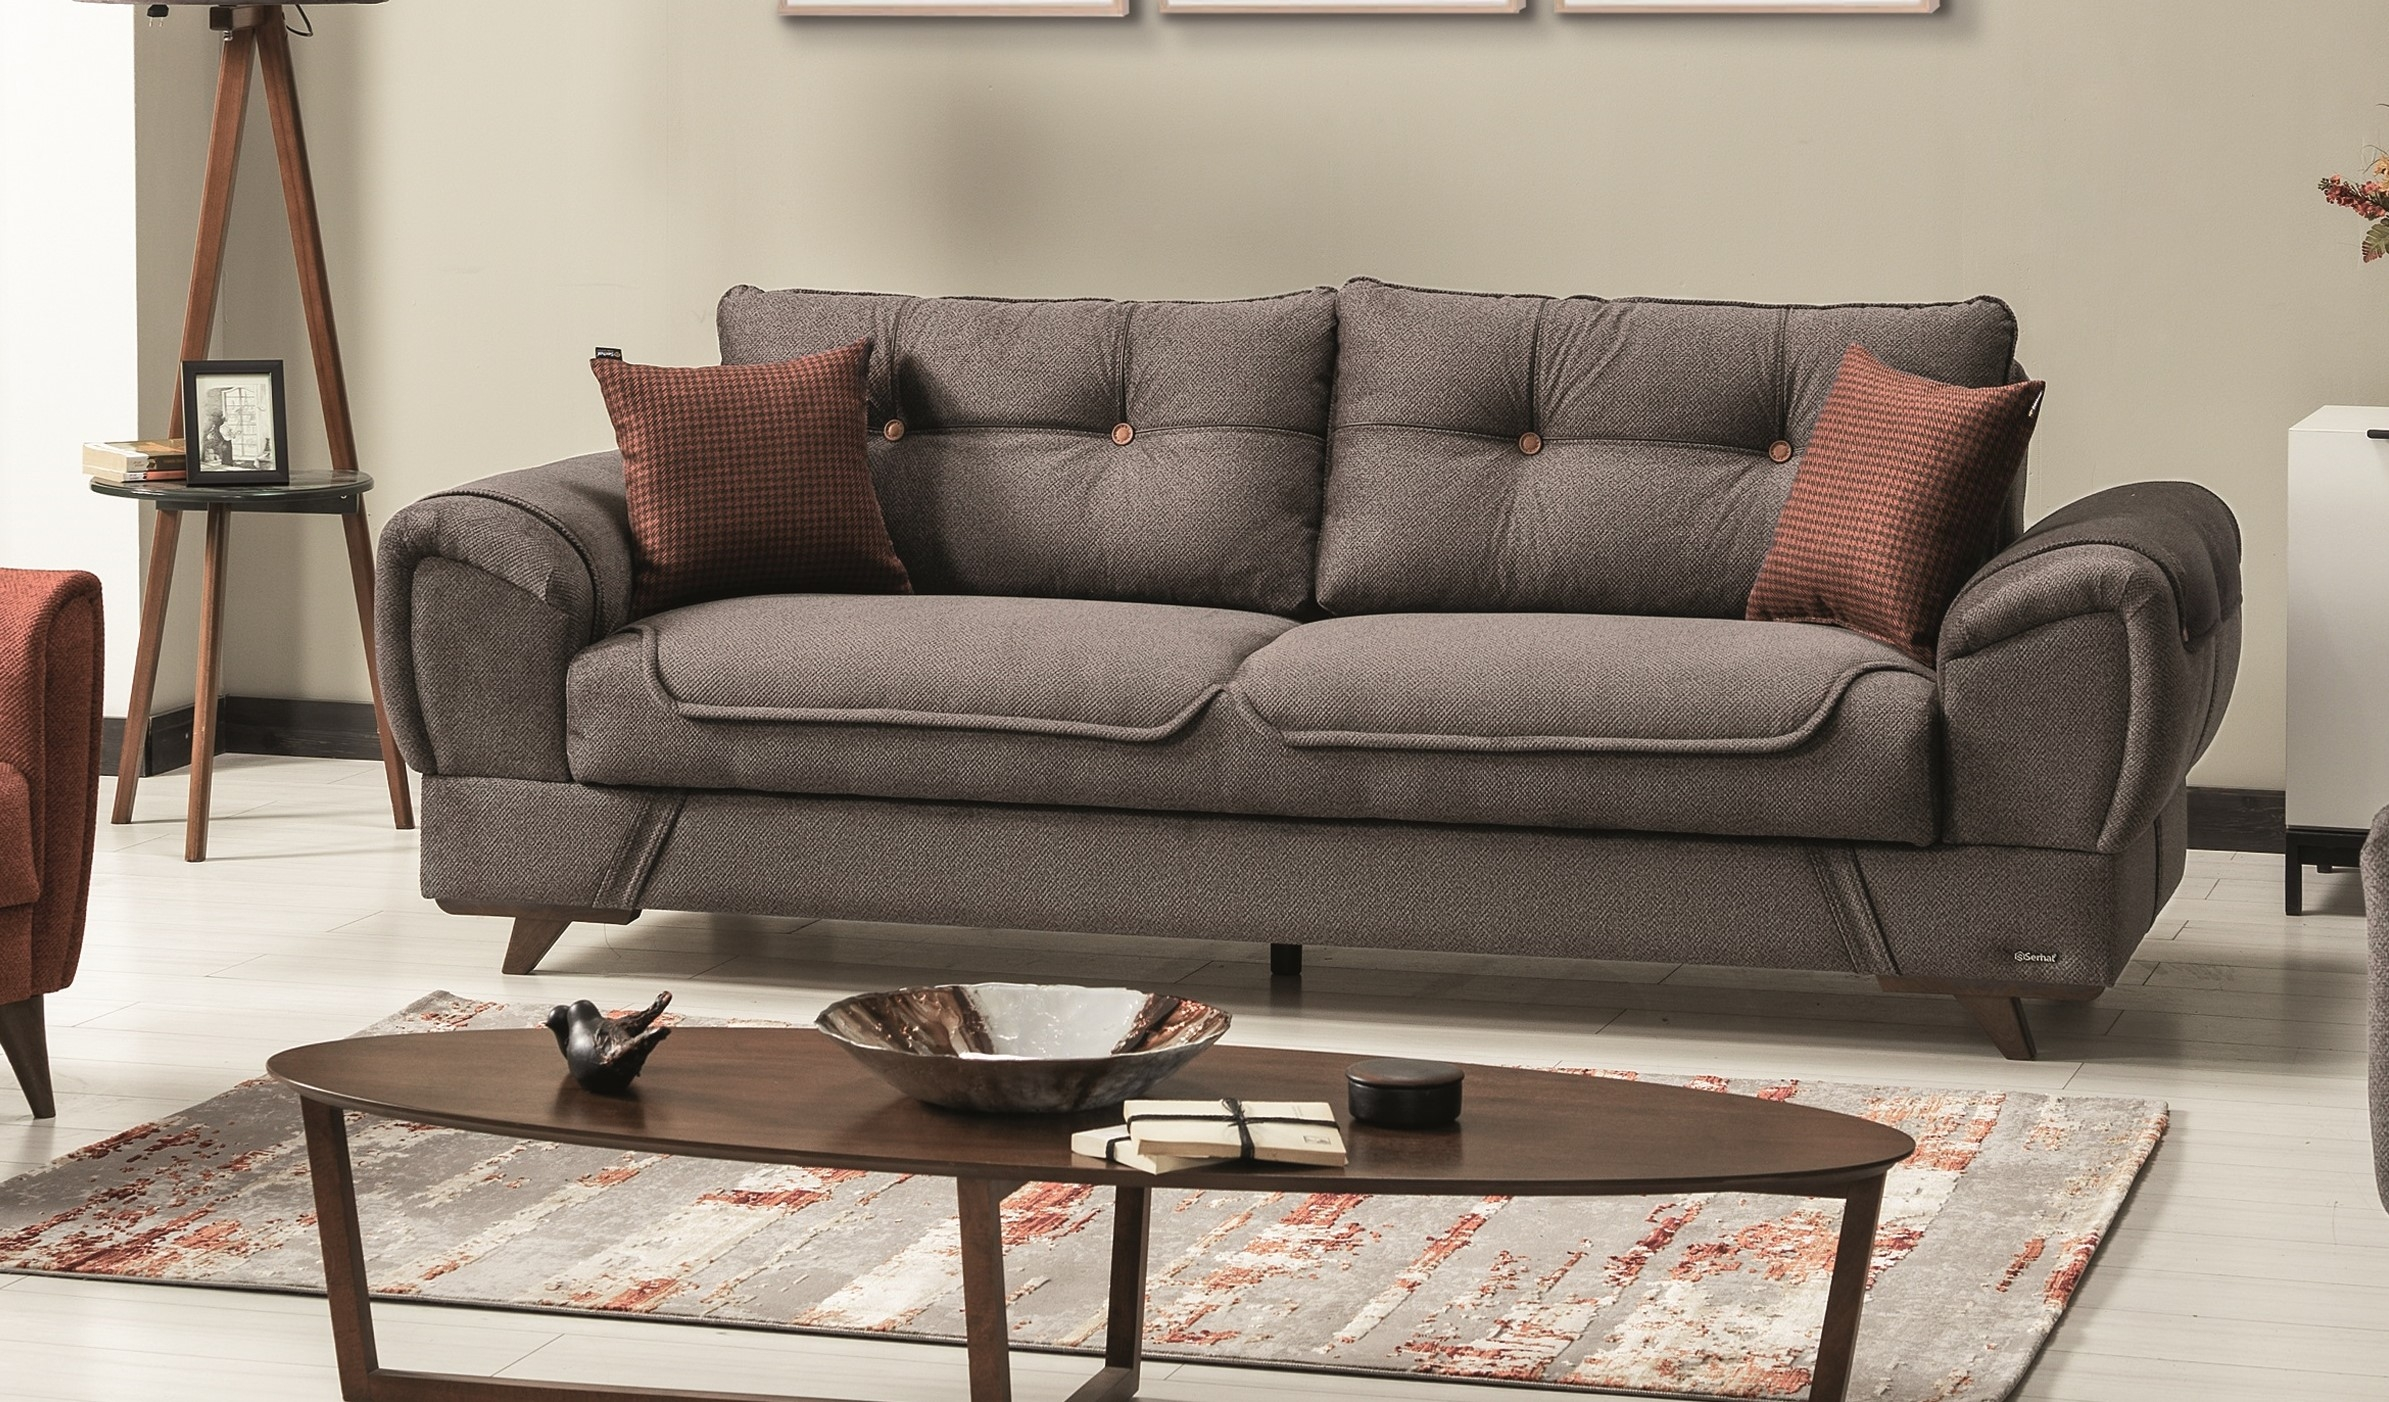 Canapea extensibila cu lada de depozitare, tapitata cu stofa si piele ecologica, 3 locuri Marla Gri K1, l254xA96xH85 cm somproduct.ro